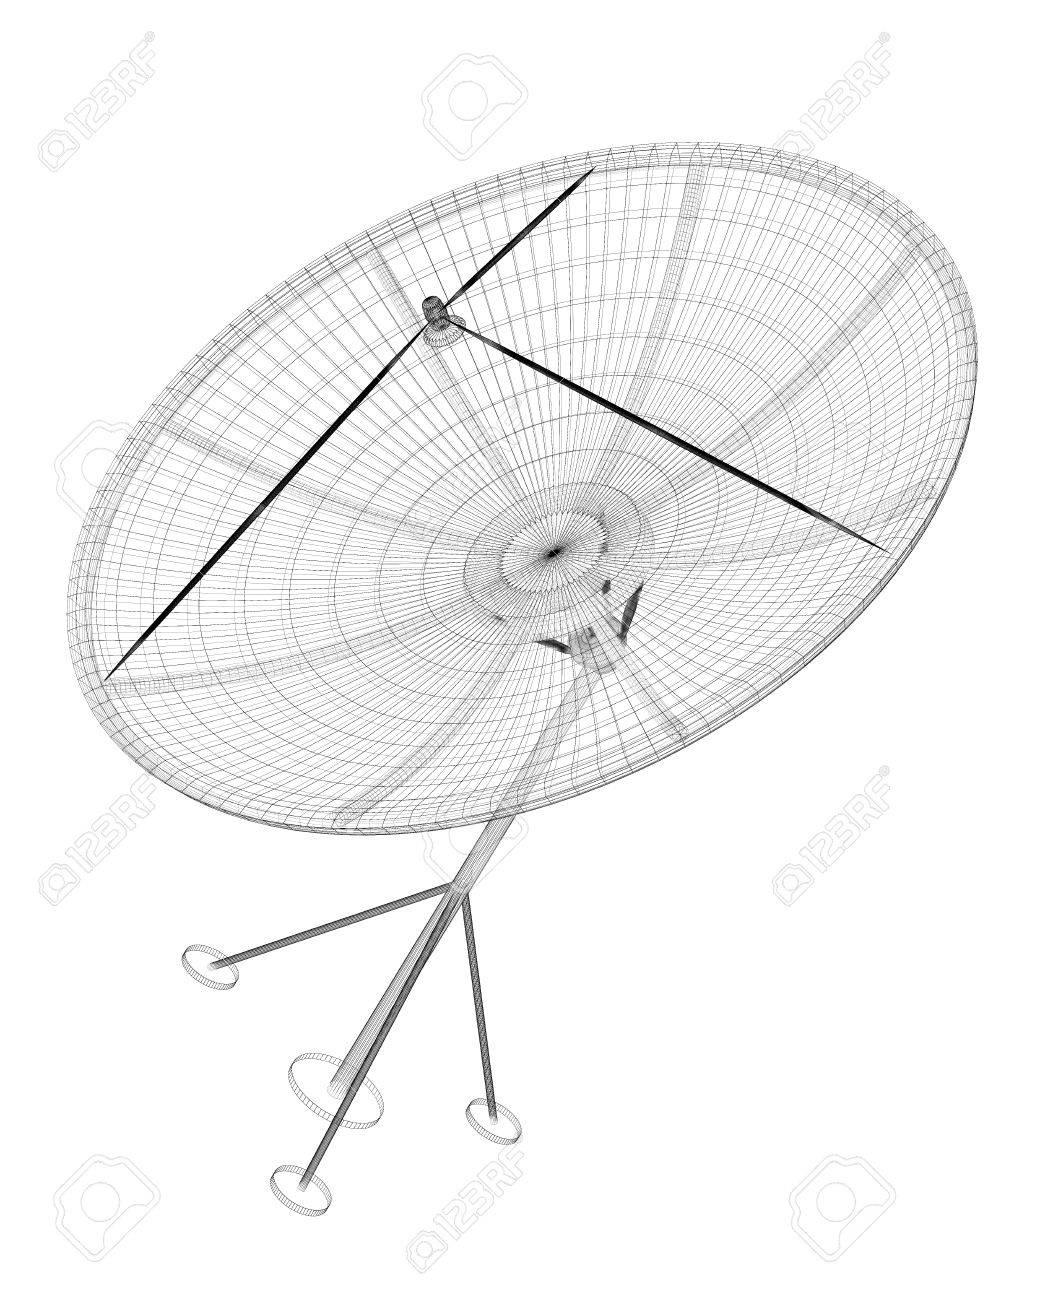 Satellite Dish Drawing at GetDrawings com   Free for